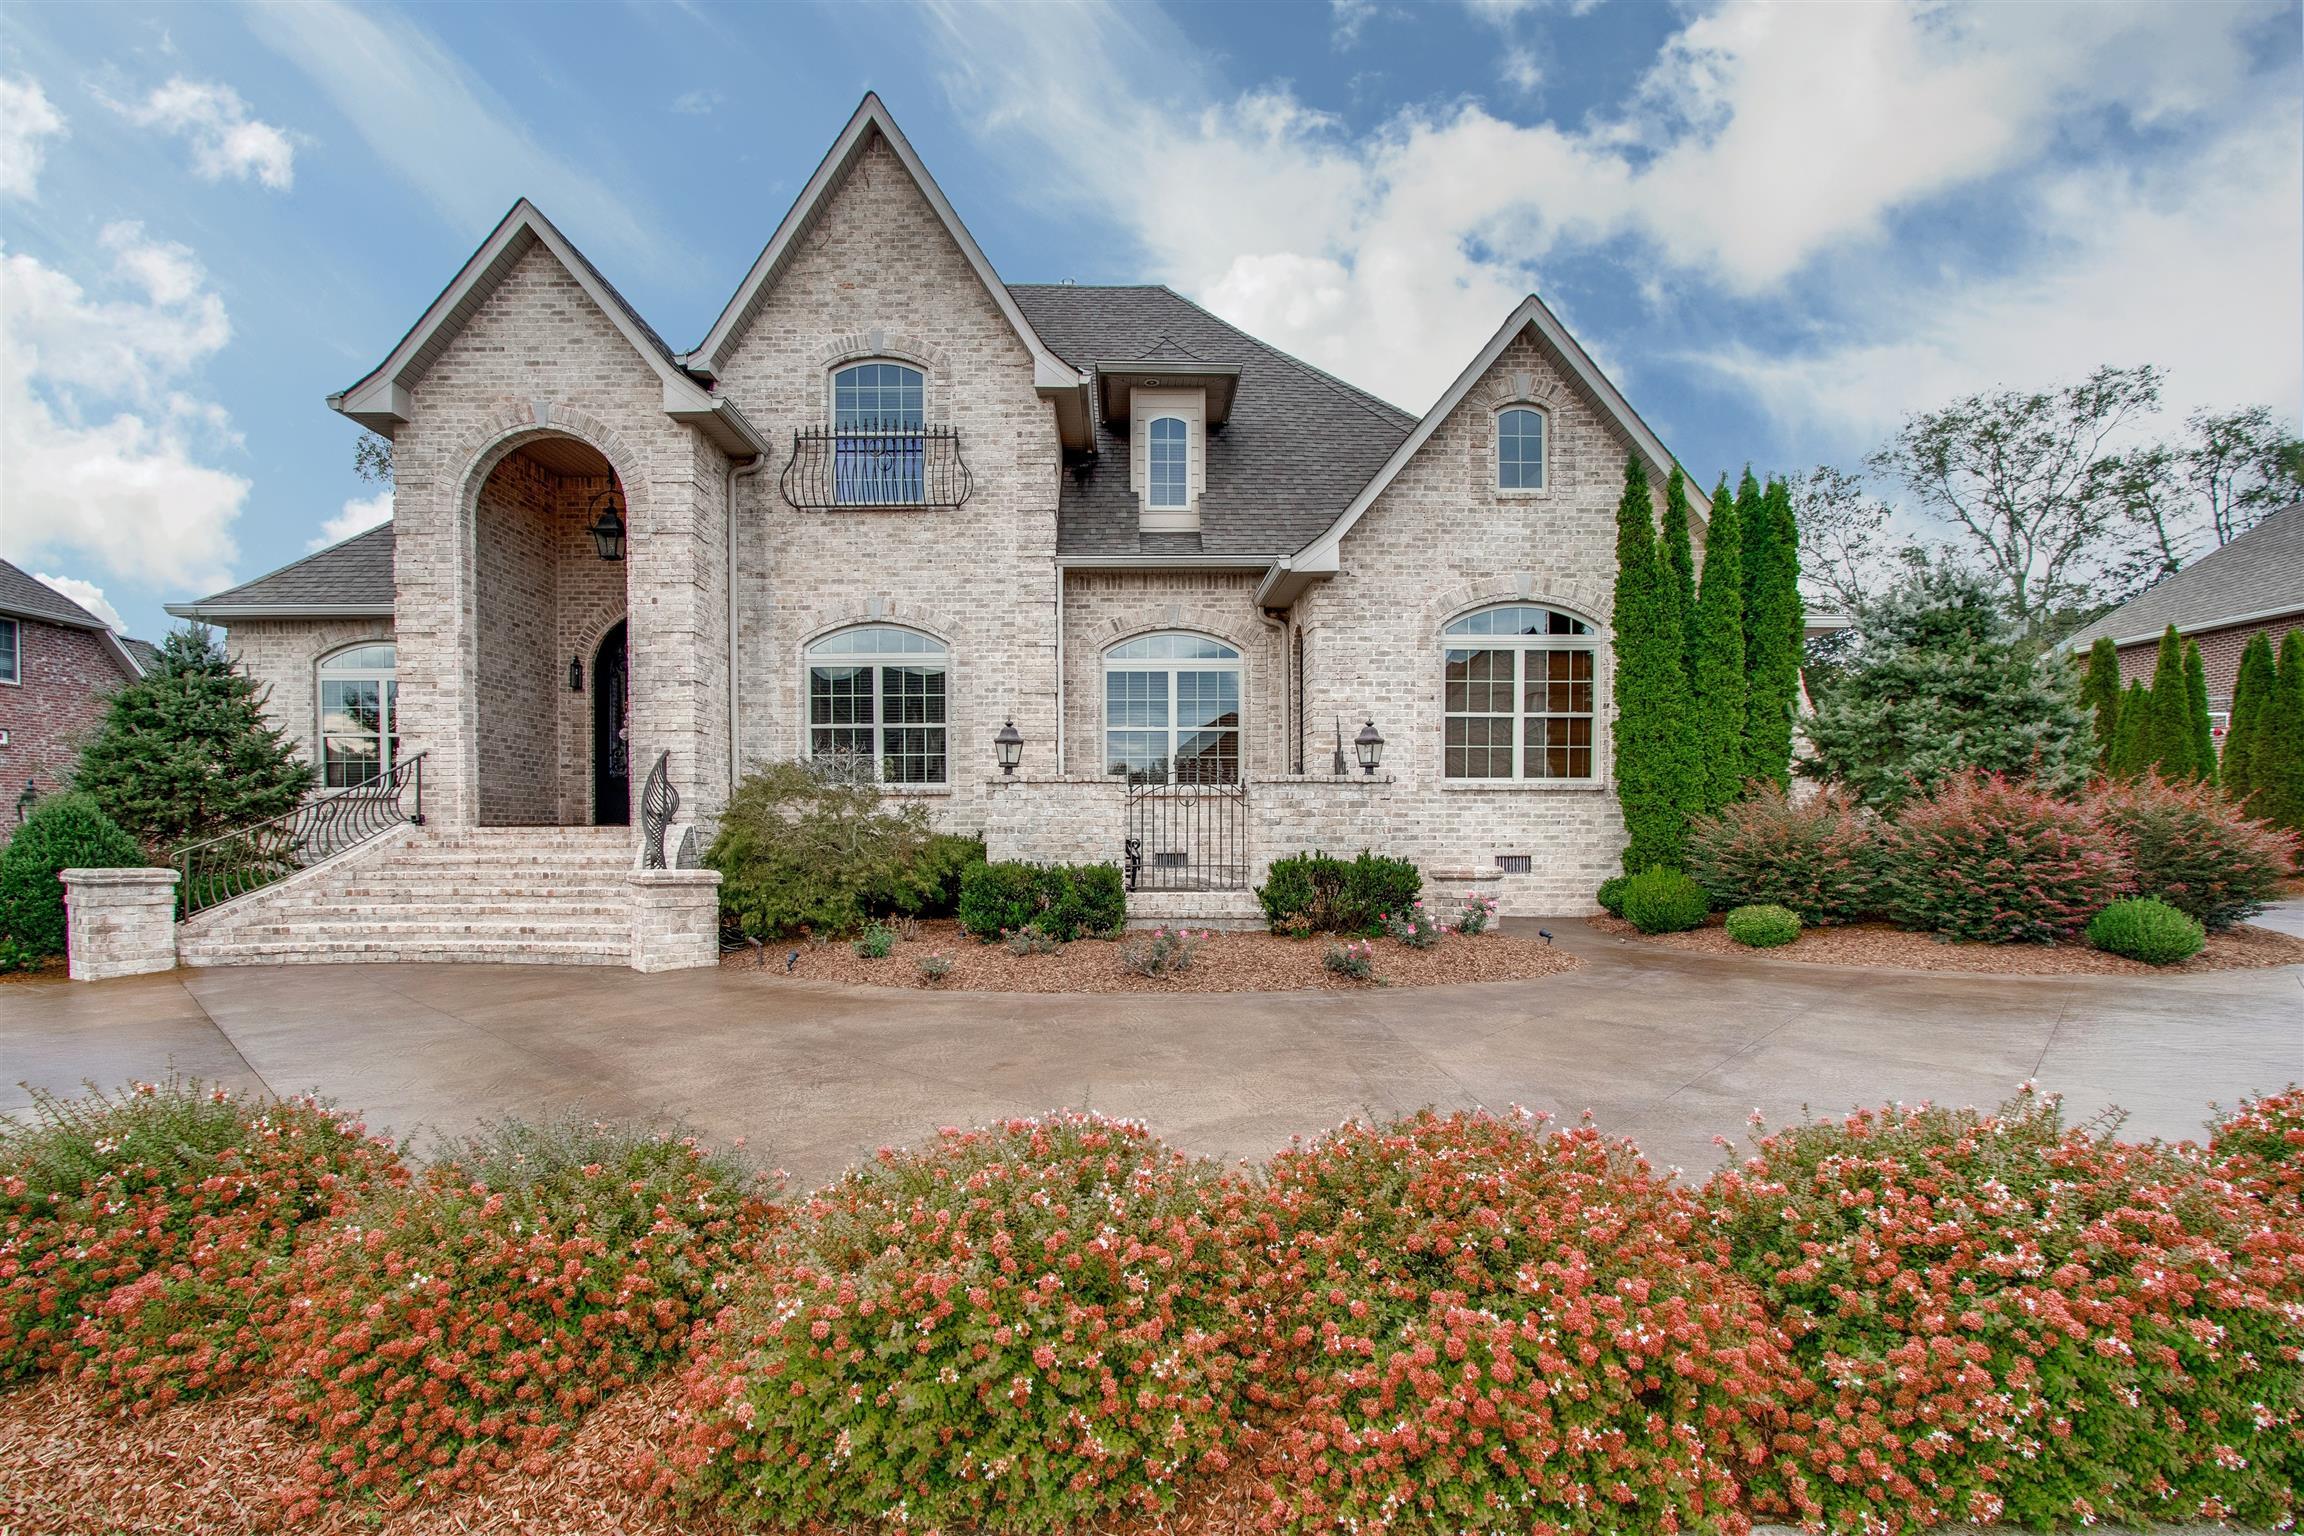 1068 Gadwall Cir, Hendersonville, TN 37075 - Hendersonville, TN real estate listing